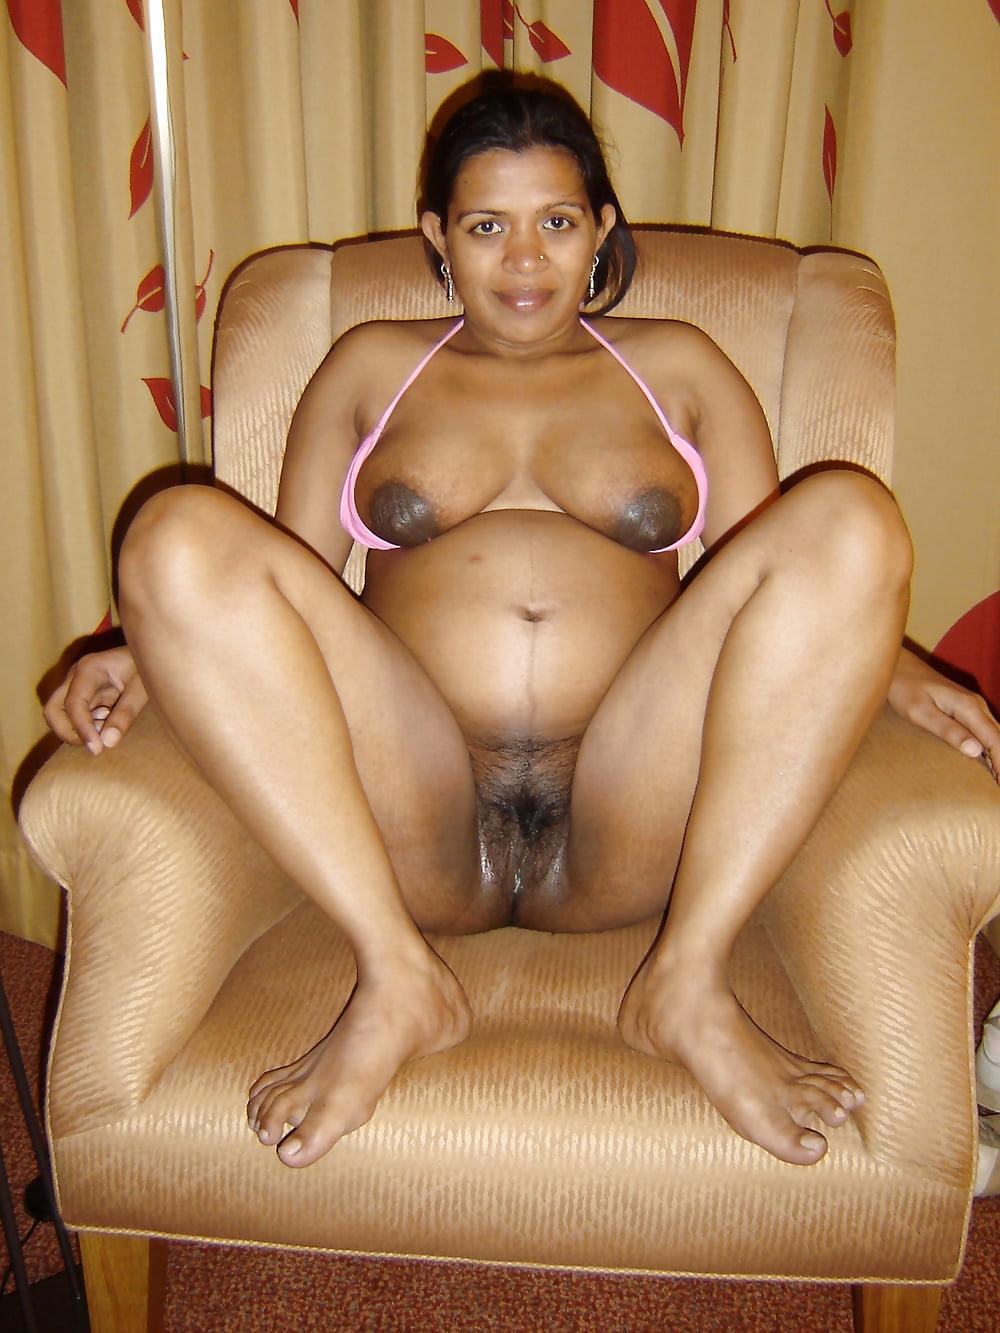 Party amateur indian women nude pics free porn the web